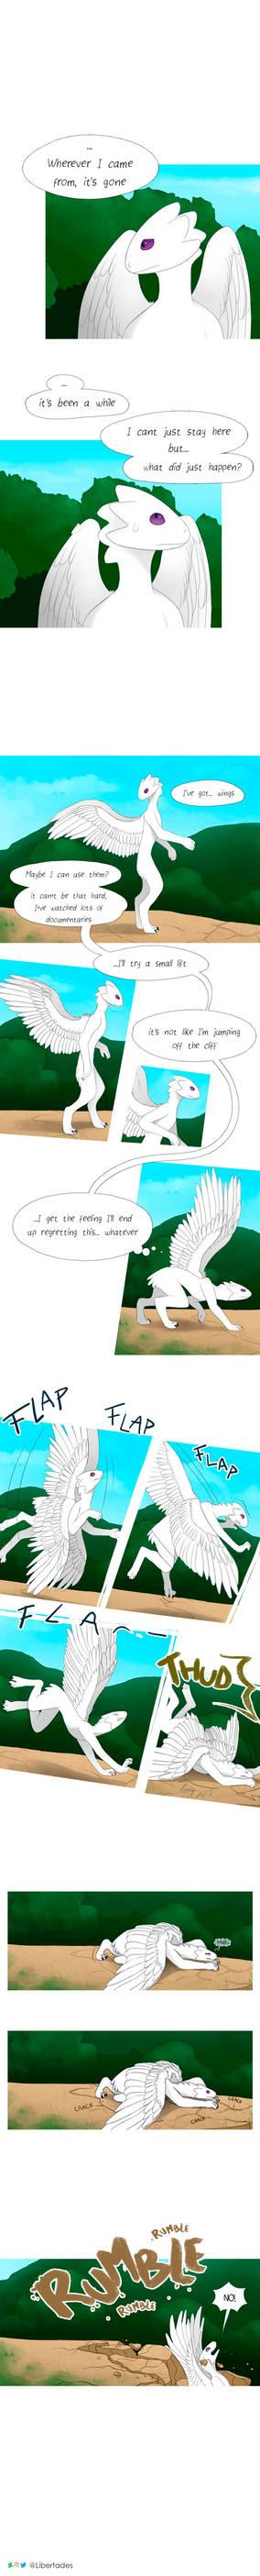 TBoC page 2